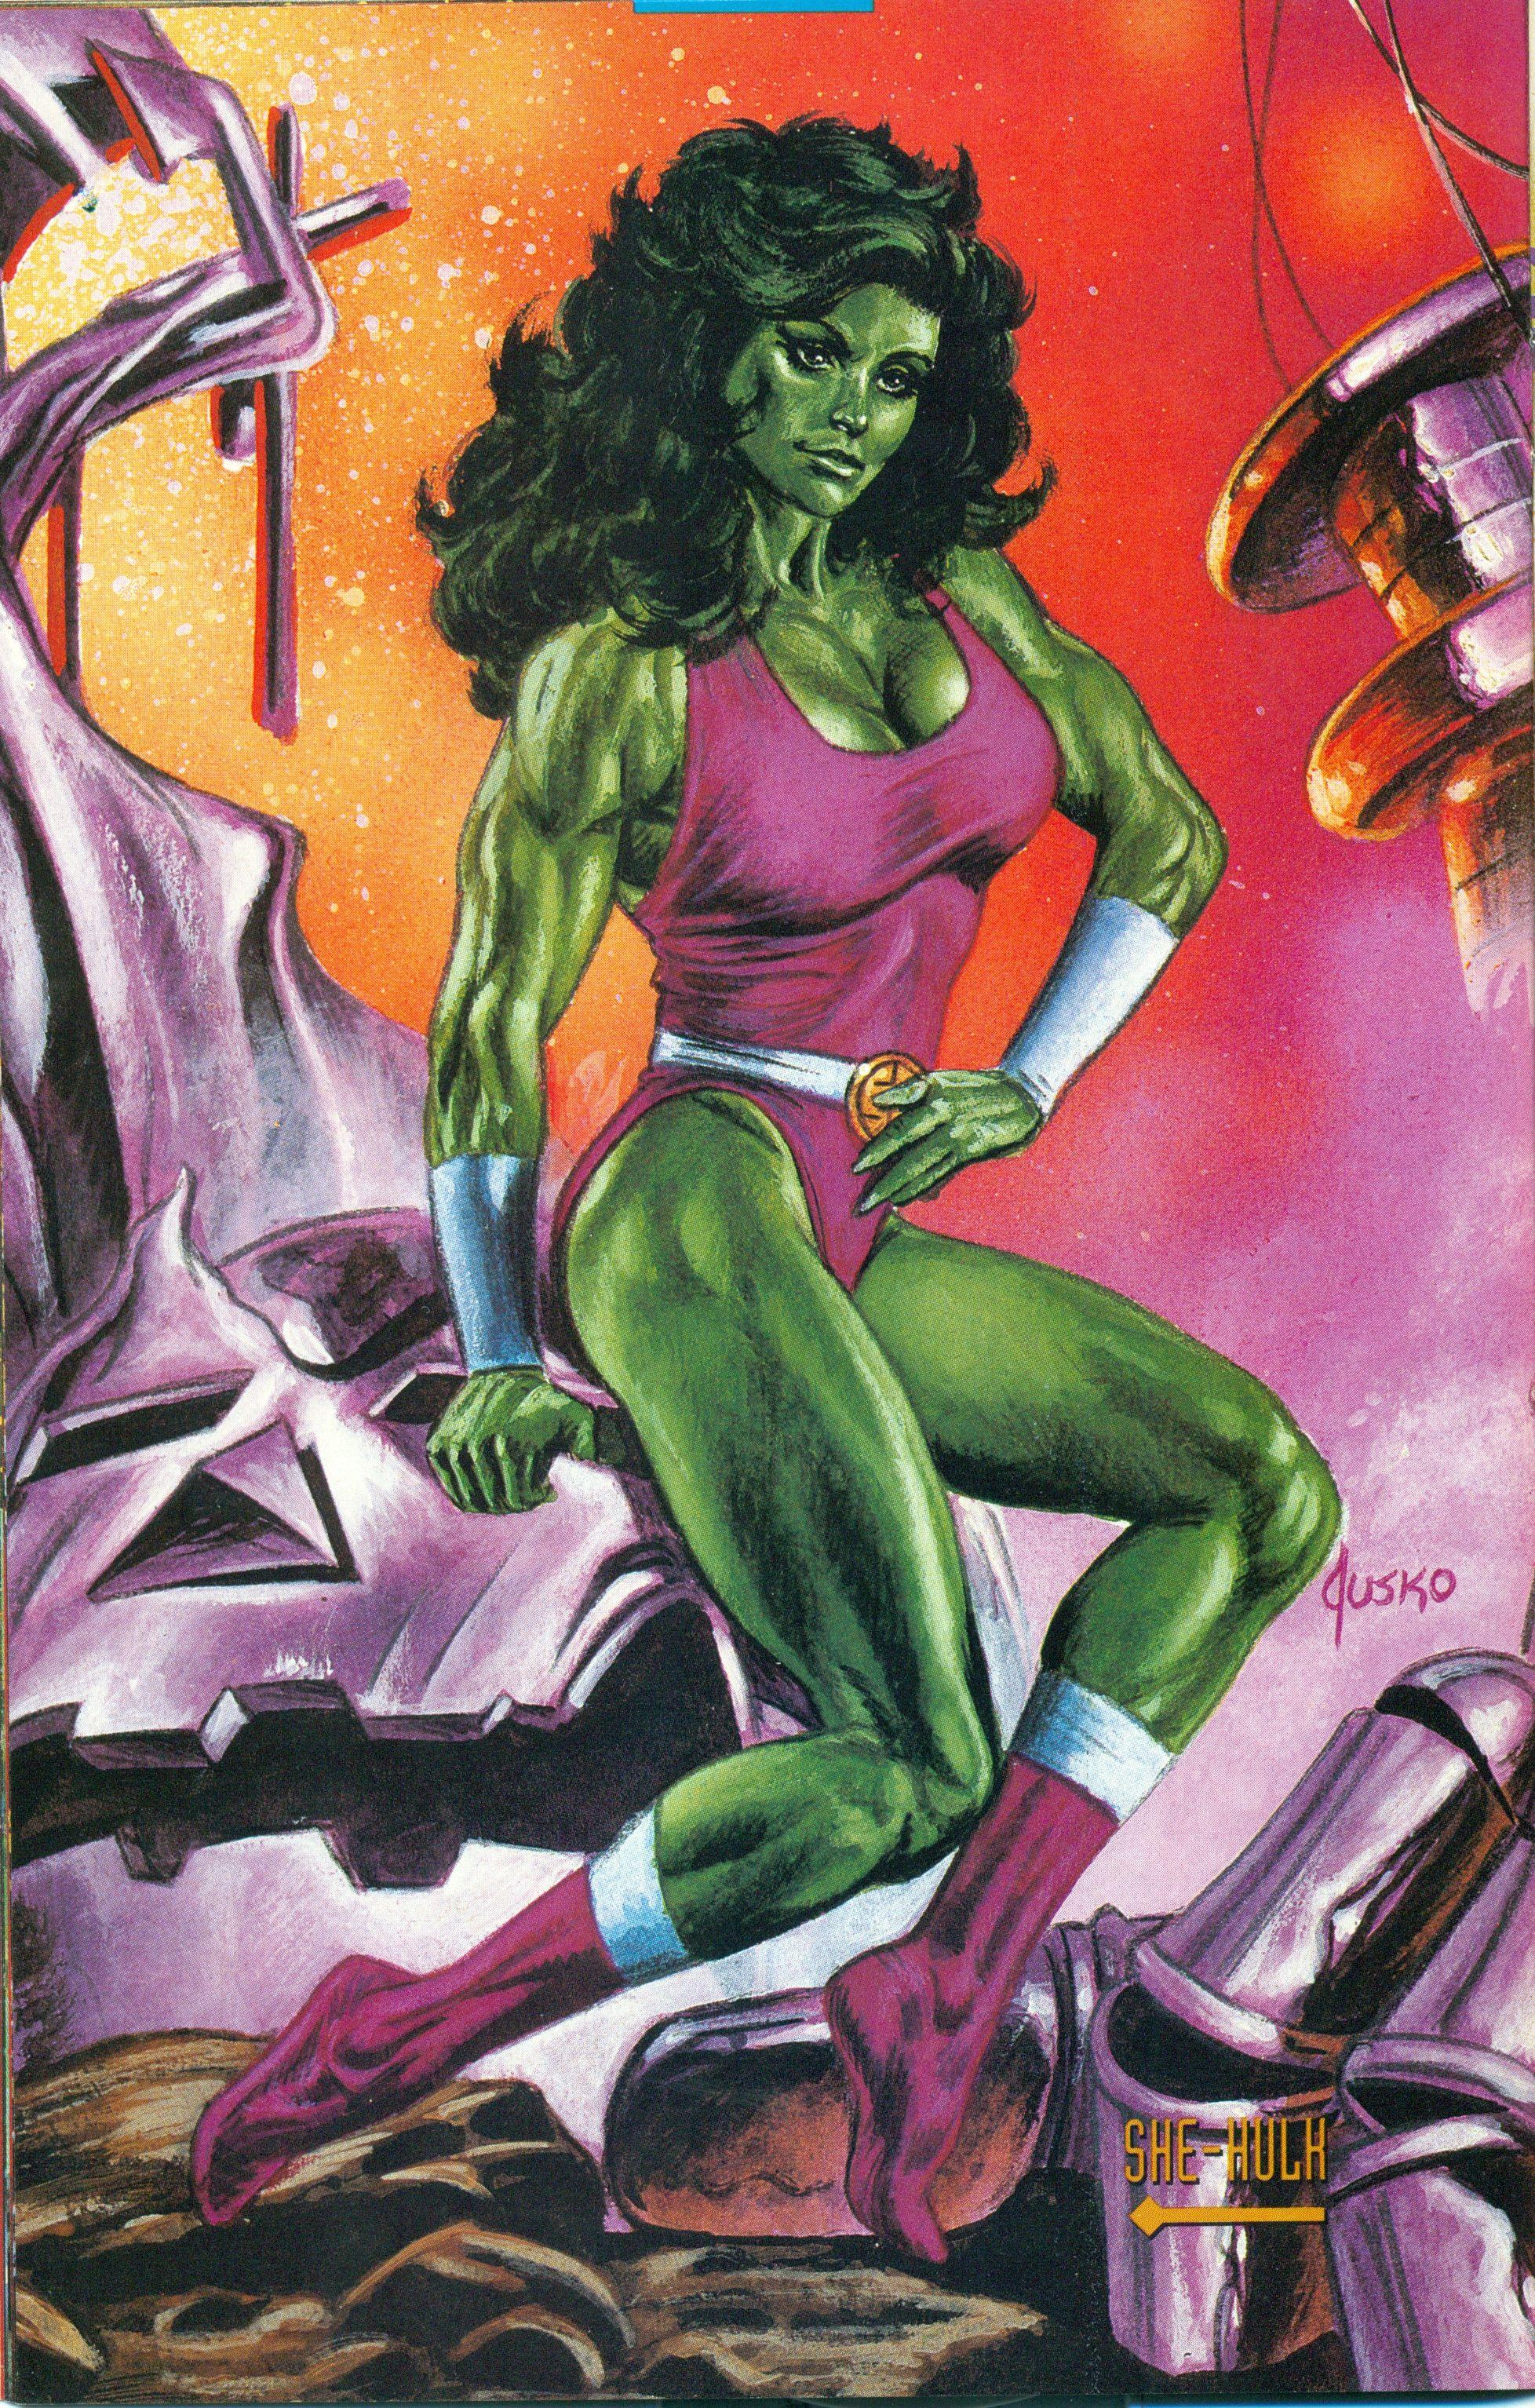 She Hulk Personajes De Marvel Superheroes Y Villanos She Hulk